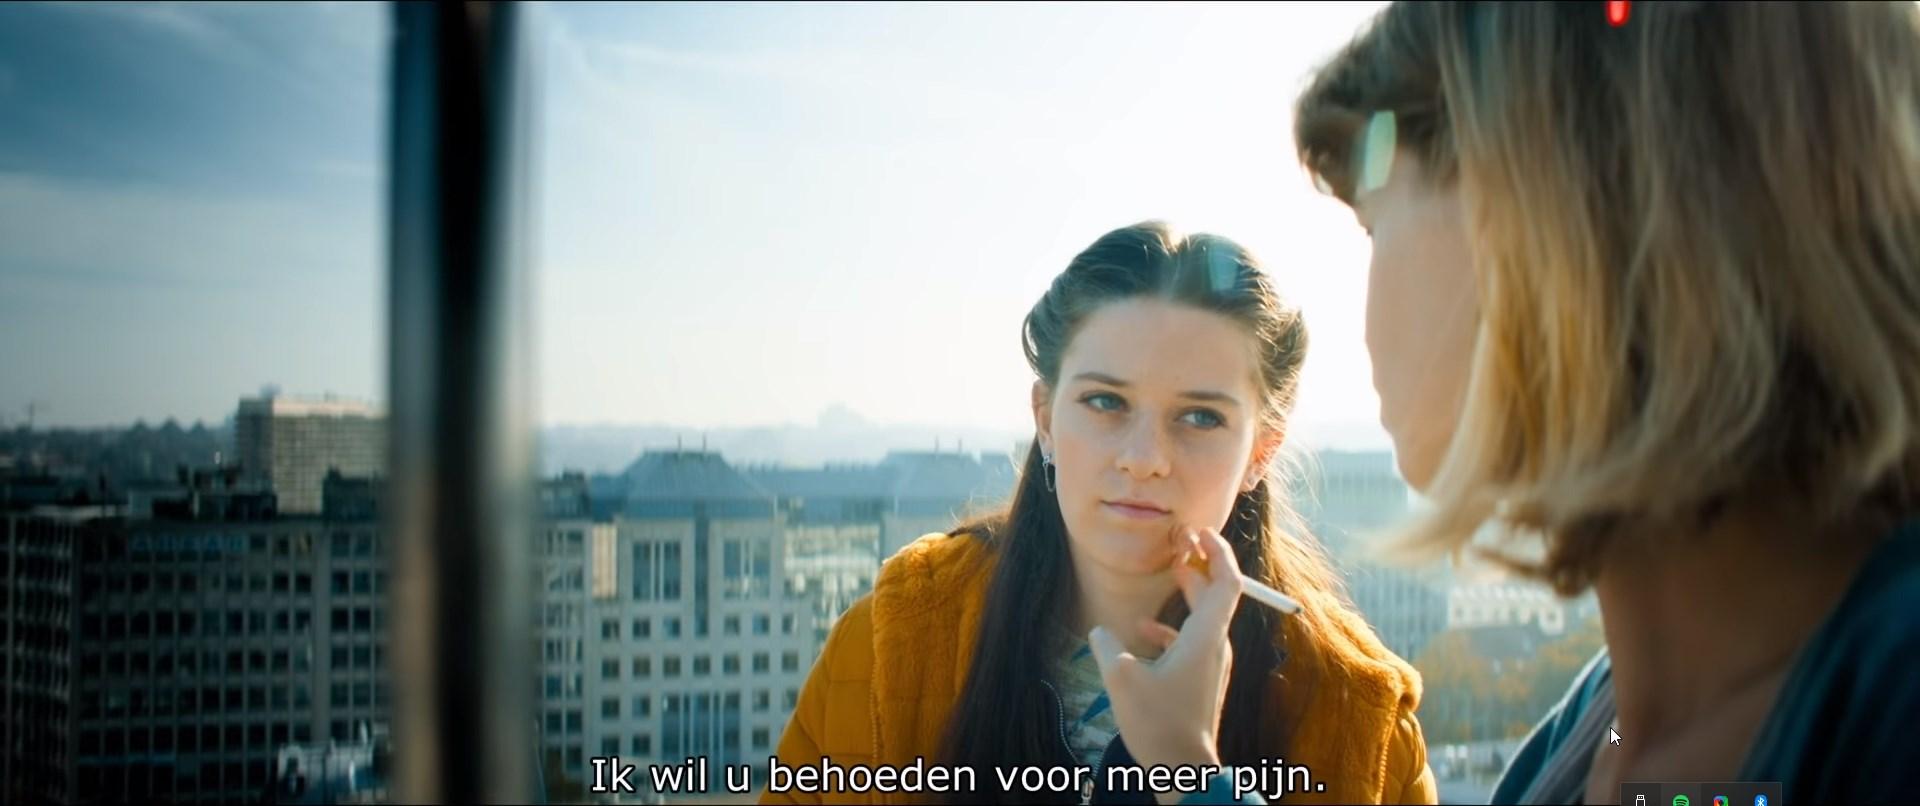 Ona-Lisa Van Haver and Maaike Neuville in All of Us (2019)